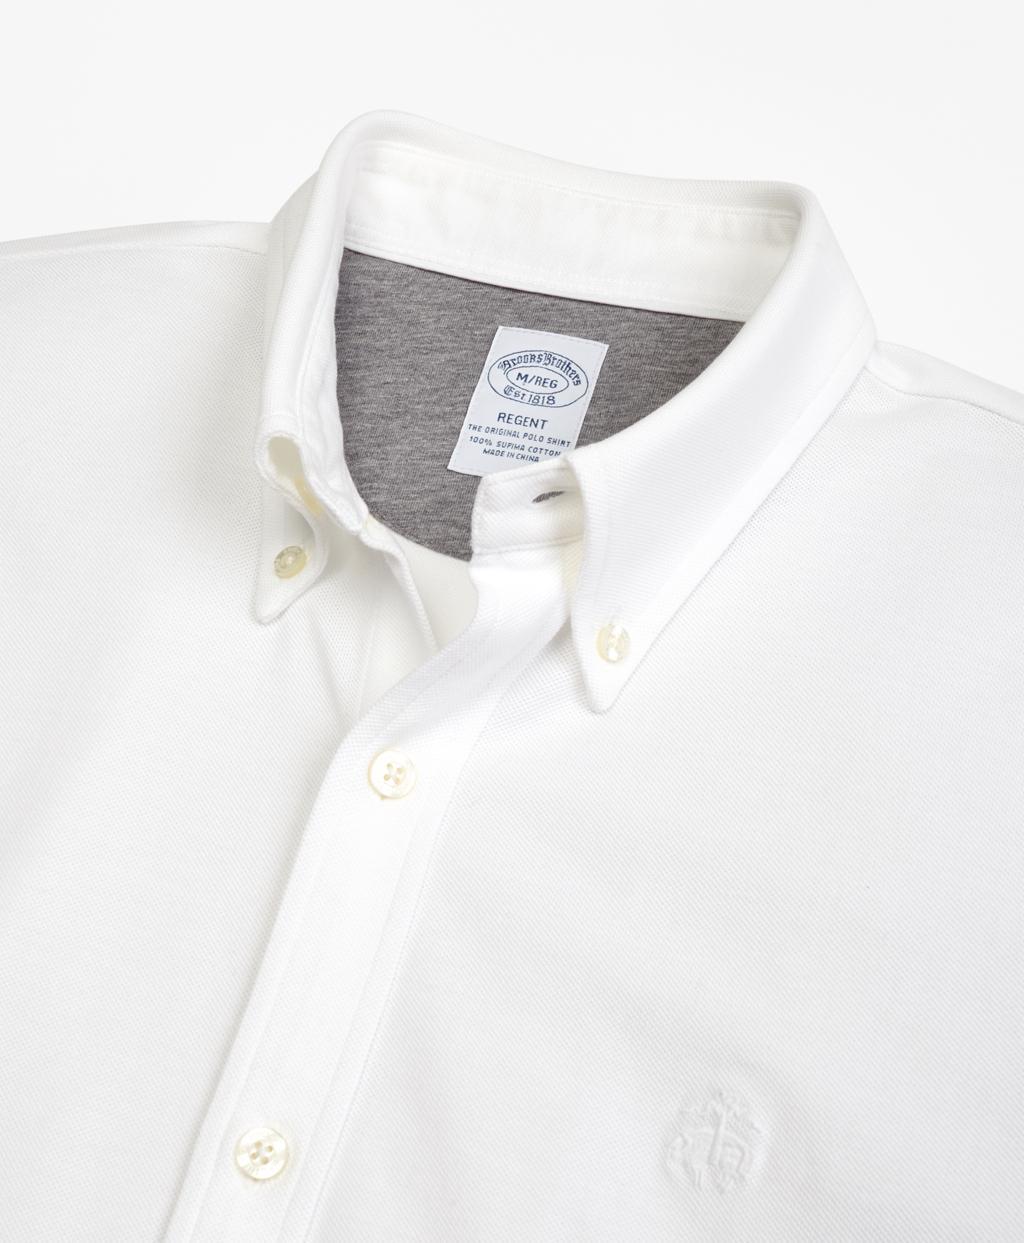 Brooks Brothers Mens Regent Fit Textured Supima Cotton Button Down Shirt Medium Grey Large//Reg